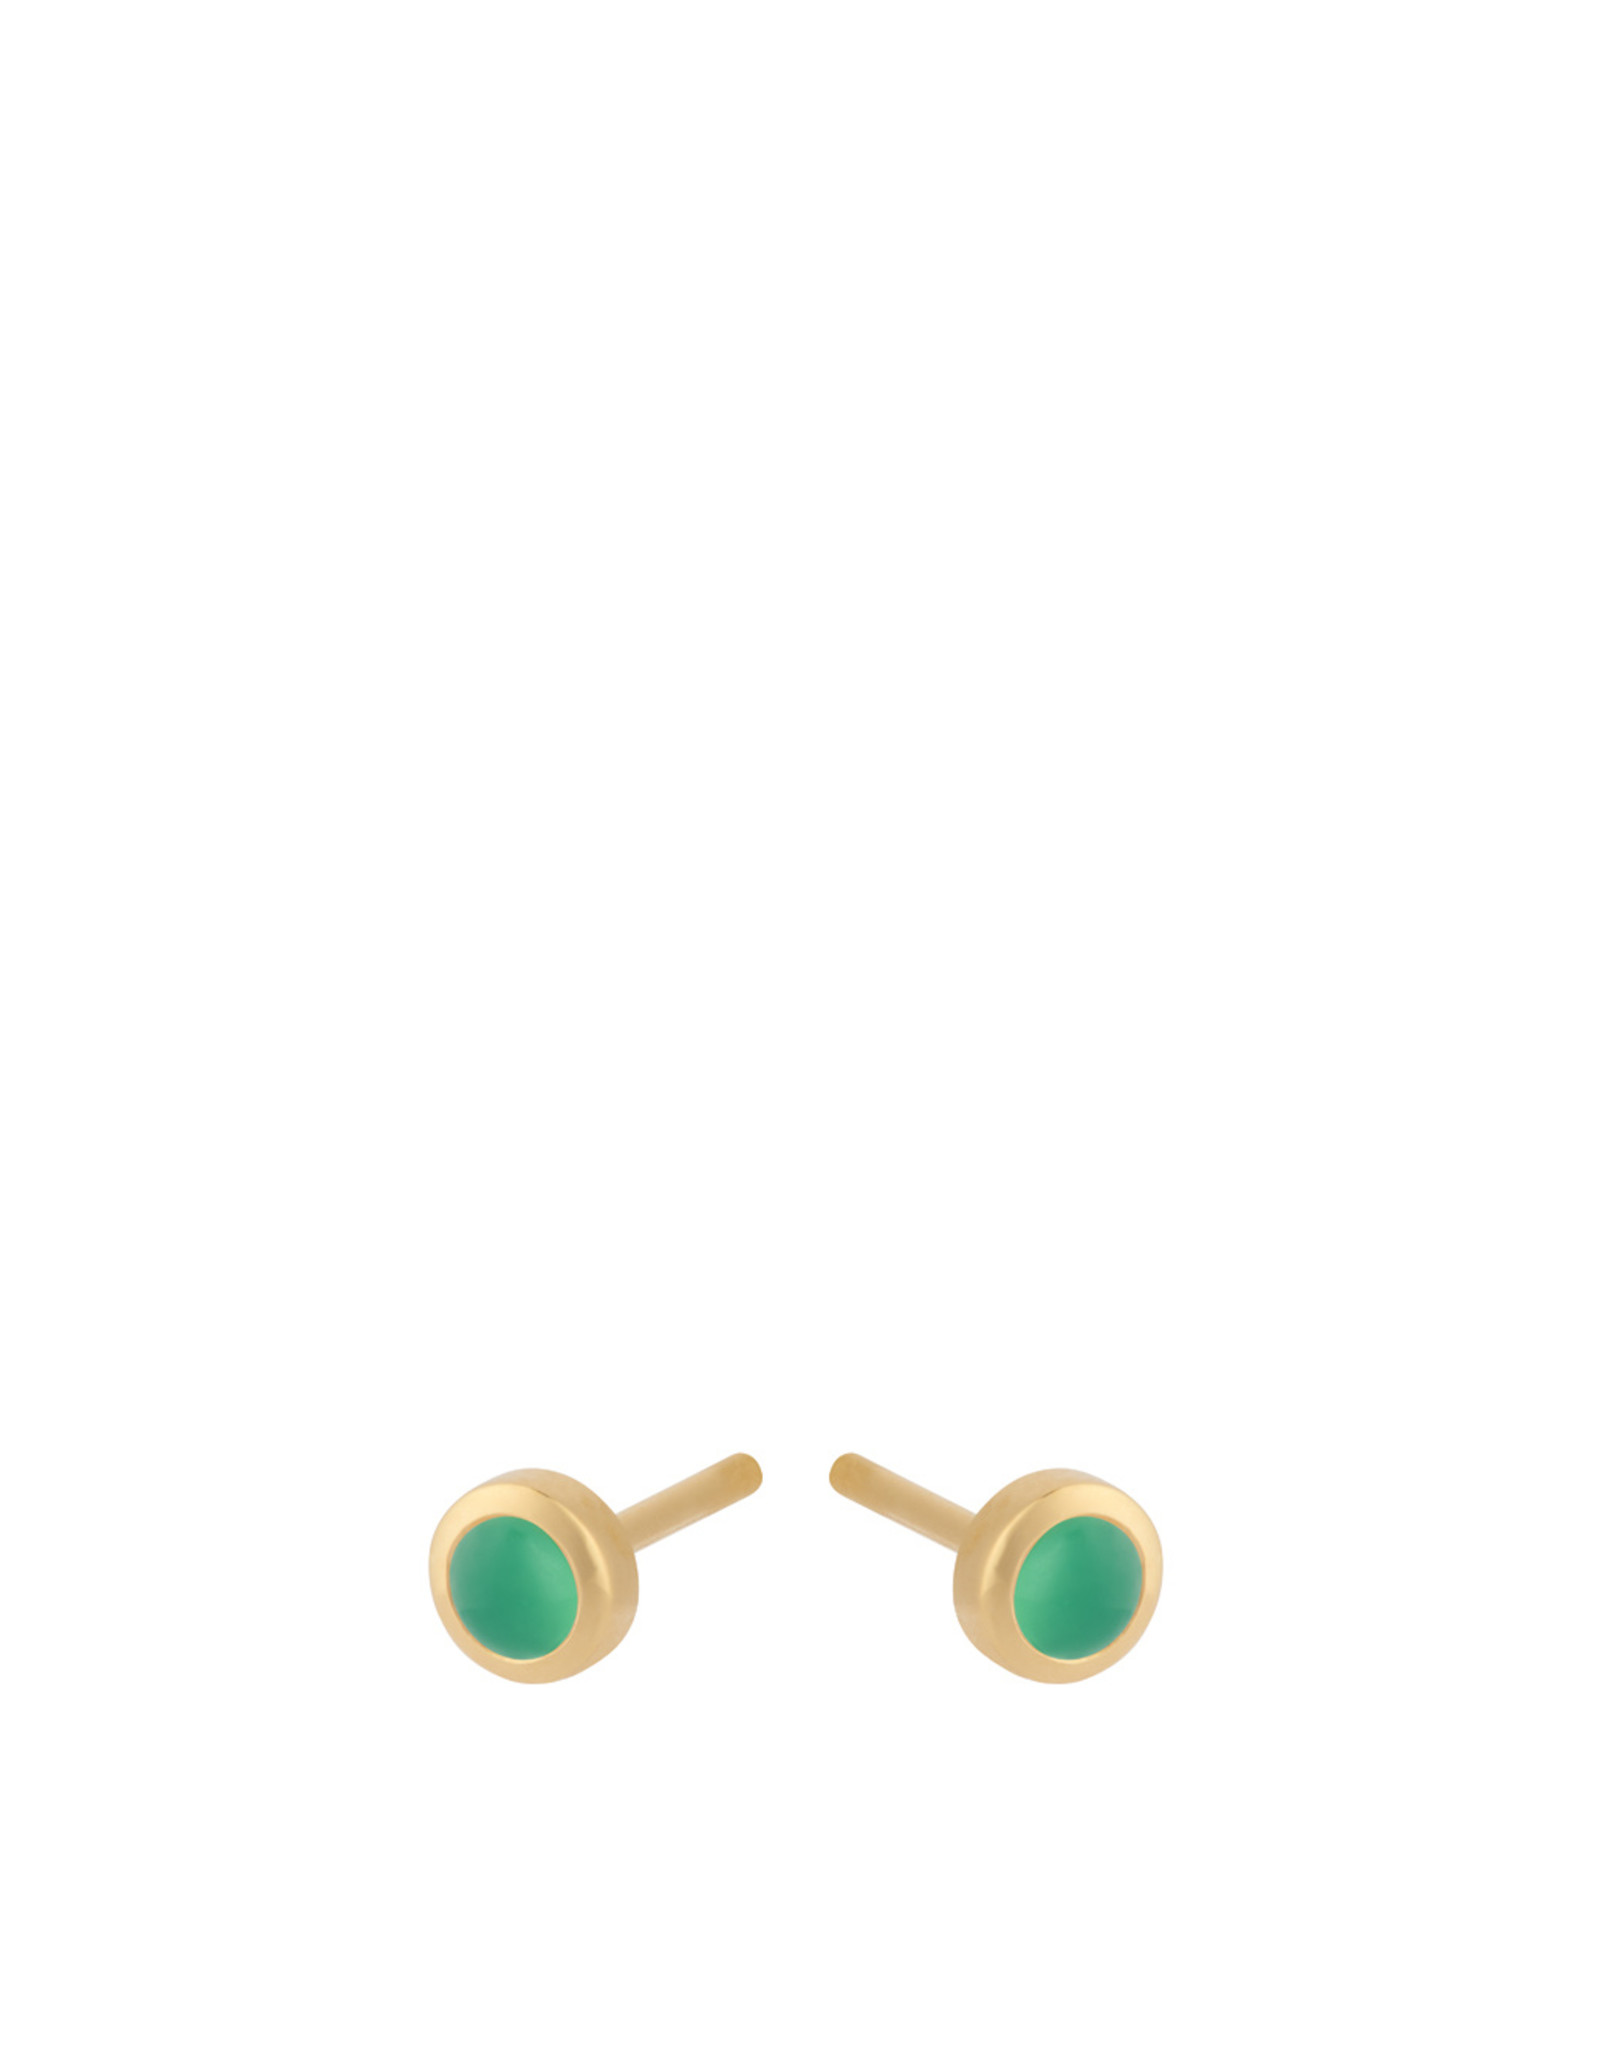 Pernille Corydon Shine Green Earsticks, chalcedony